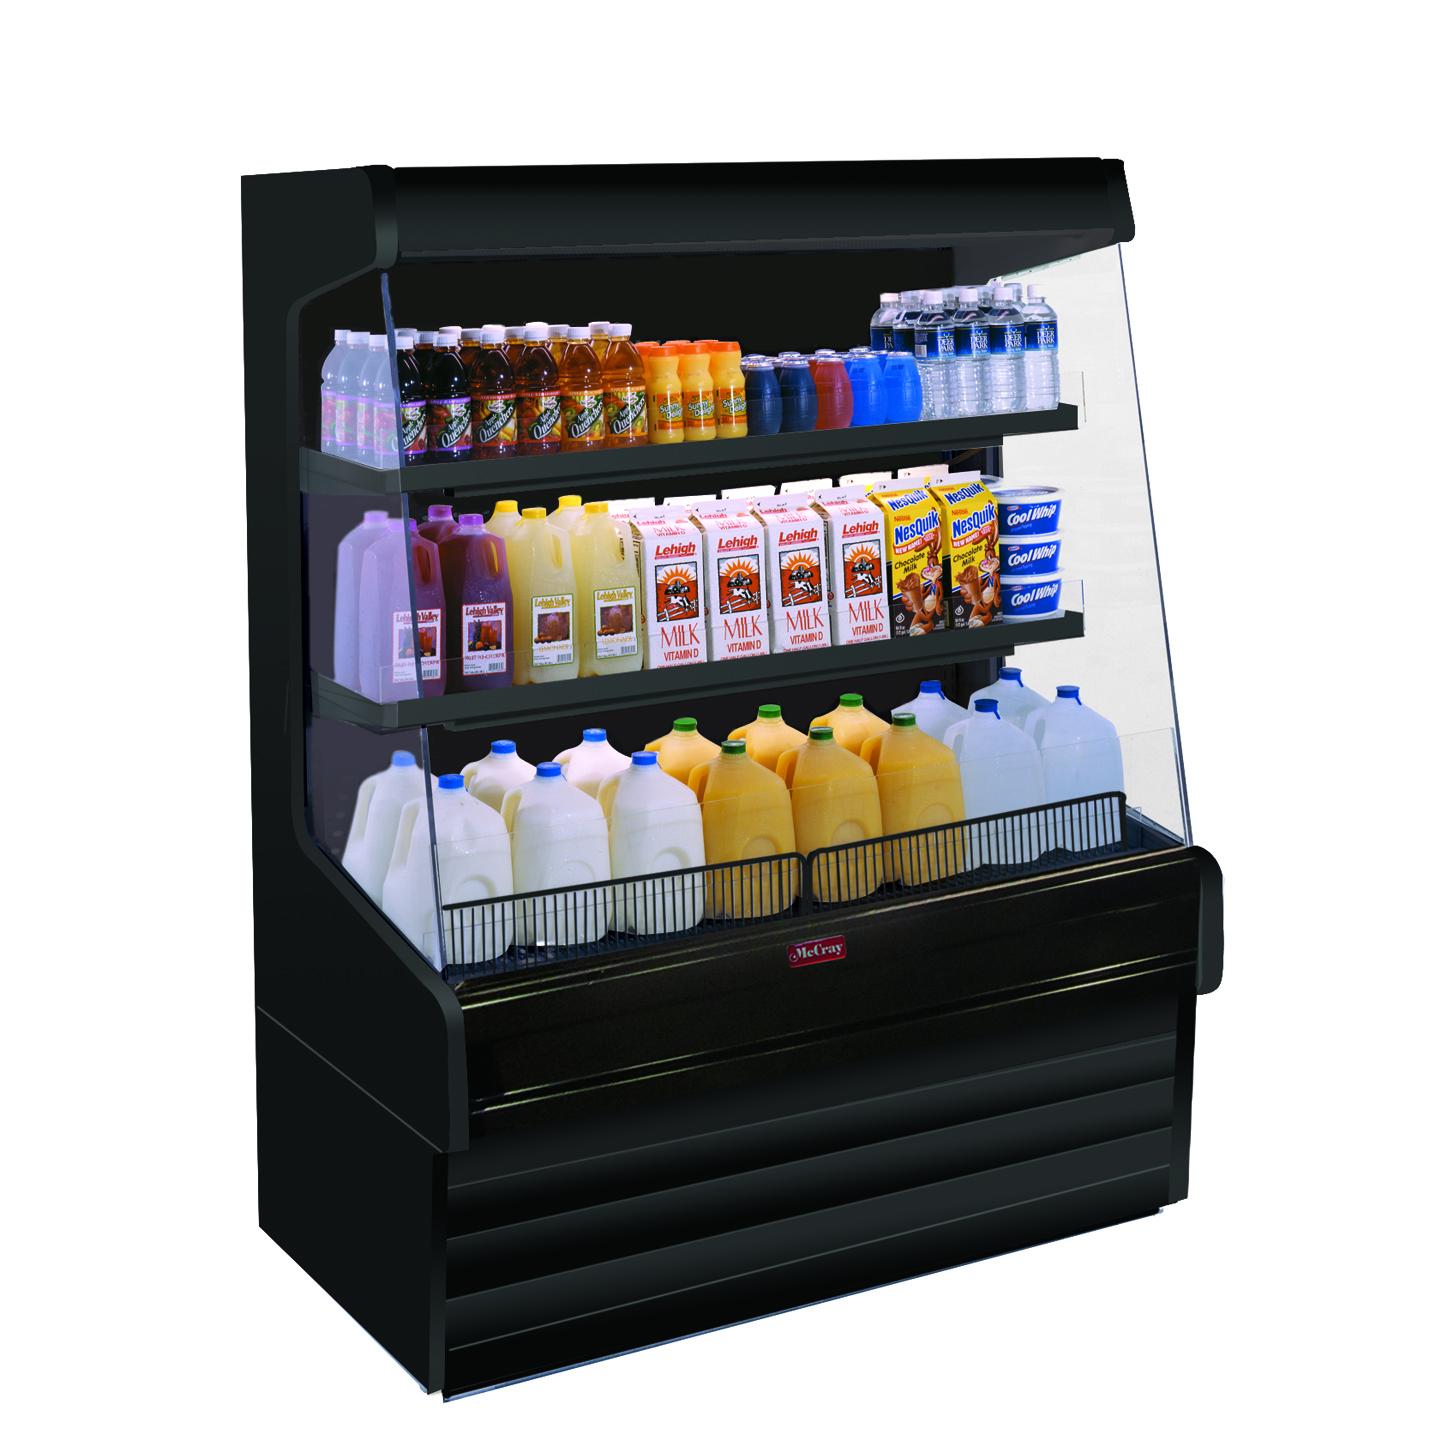 Howard-McCray SC-OD30E-6L-B-LED merchandiser, open refrigerated display